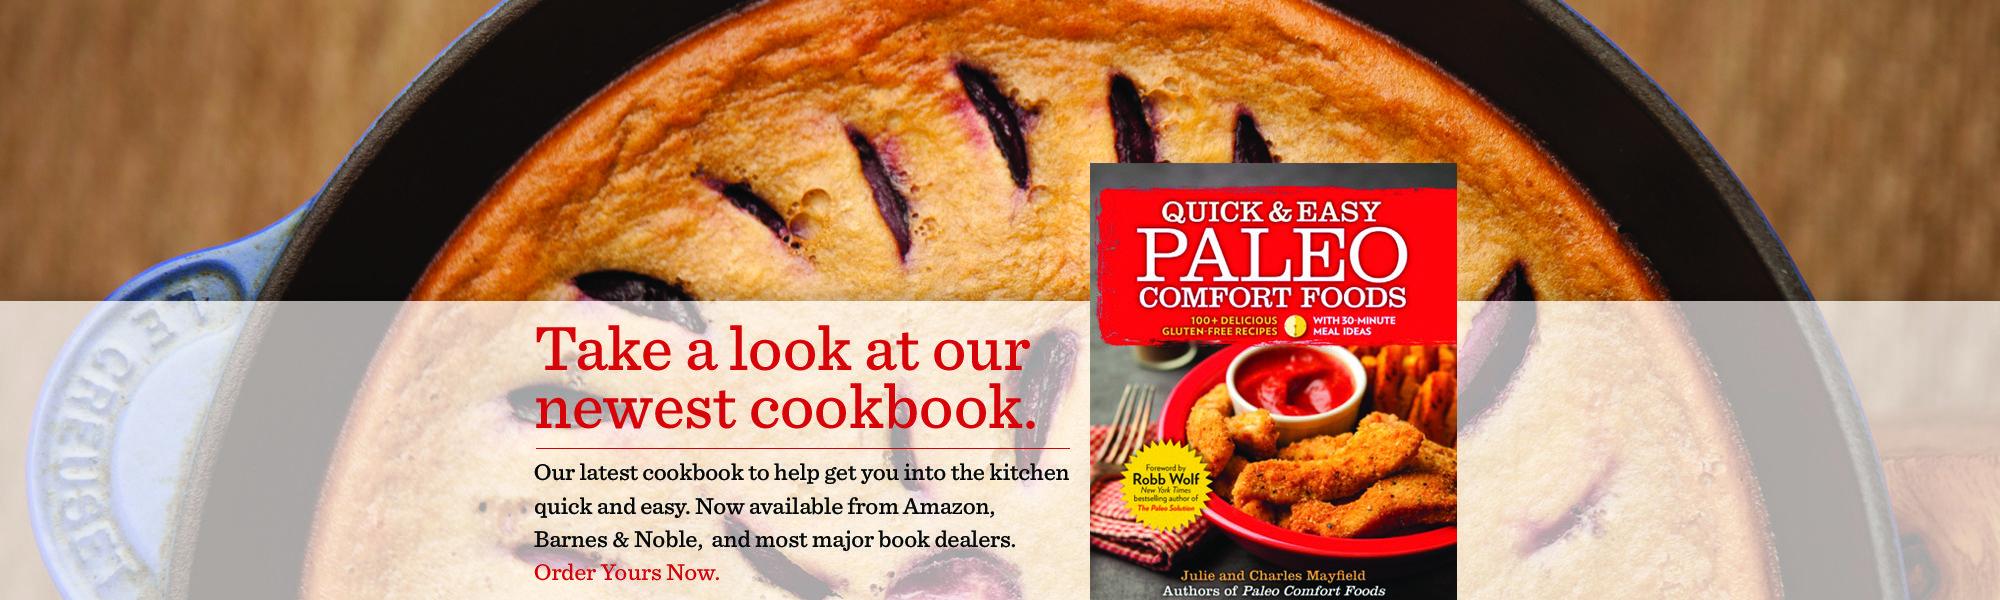 Paleo comfort foods paleo food cookbook and recipes eat me healthy recipes paleo comfort foods paleo food cookbook forumfinder Images